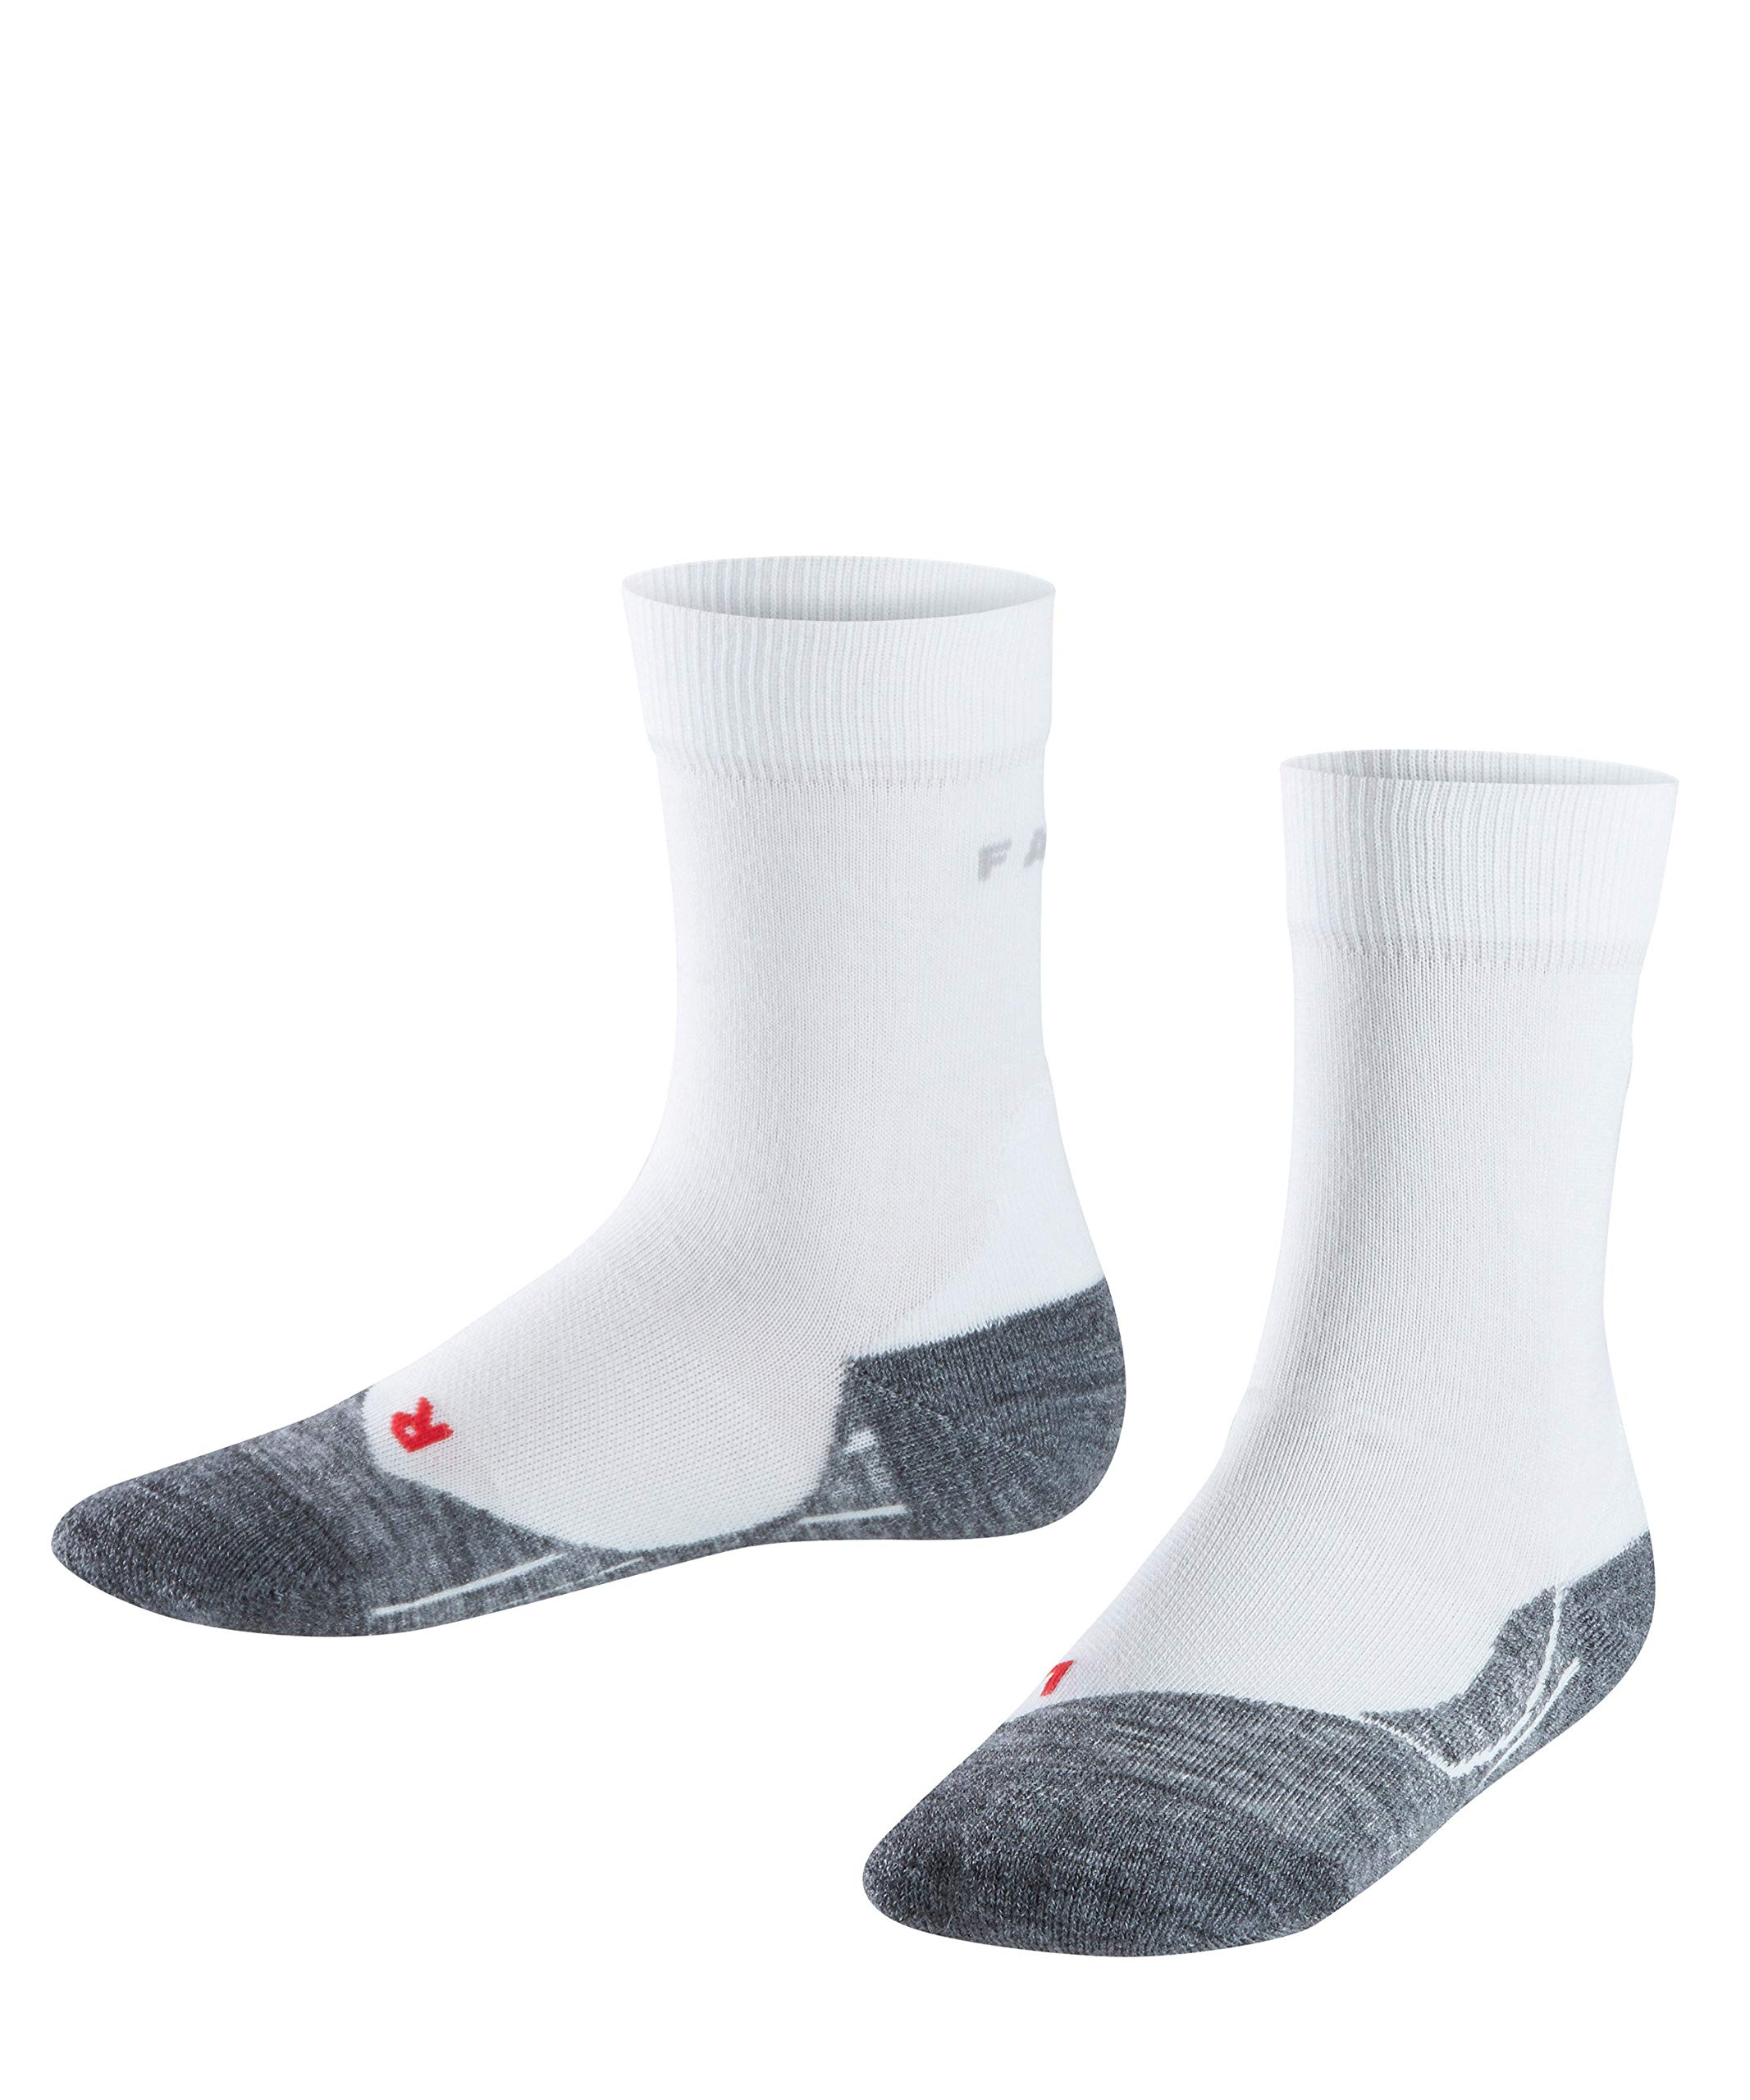 FALKE Kinder Laufsocken RU4, kurze Sportsocken mit Baumwolle, 1 er Pack, Weiß (